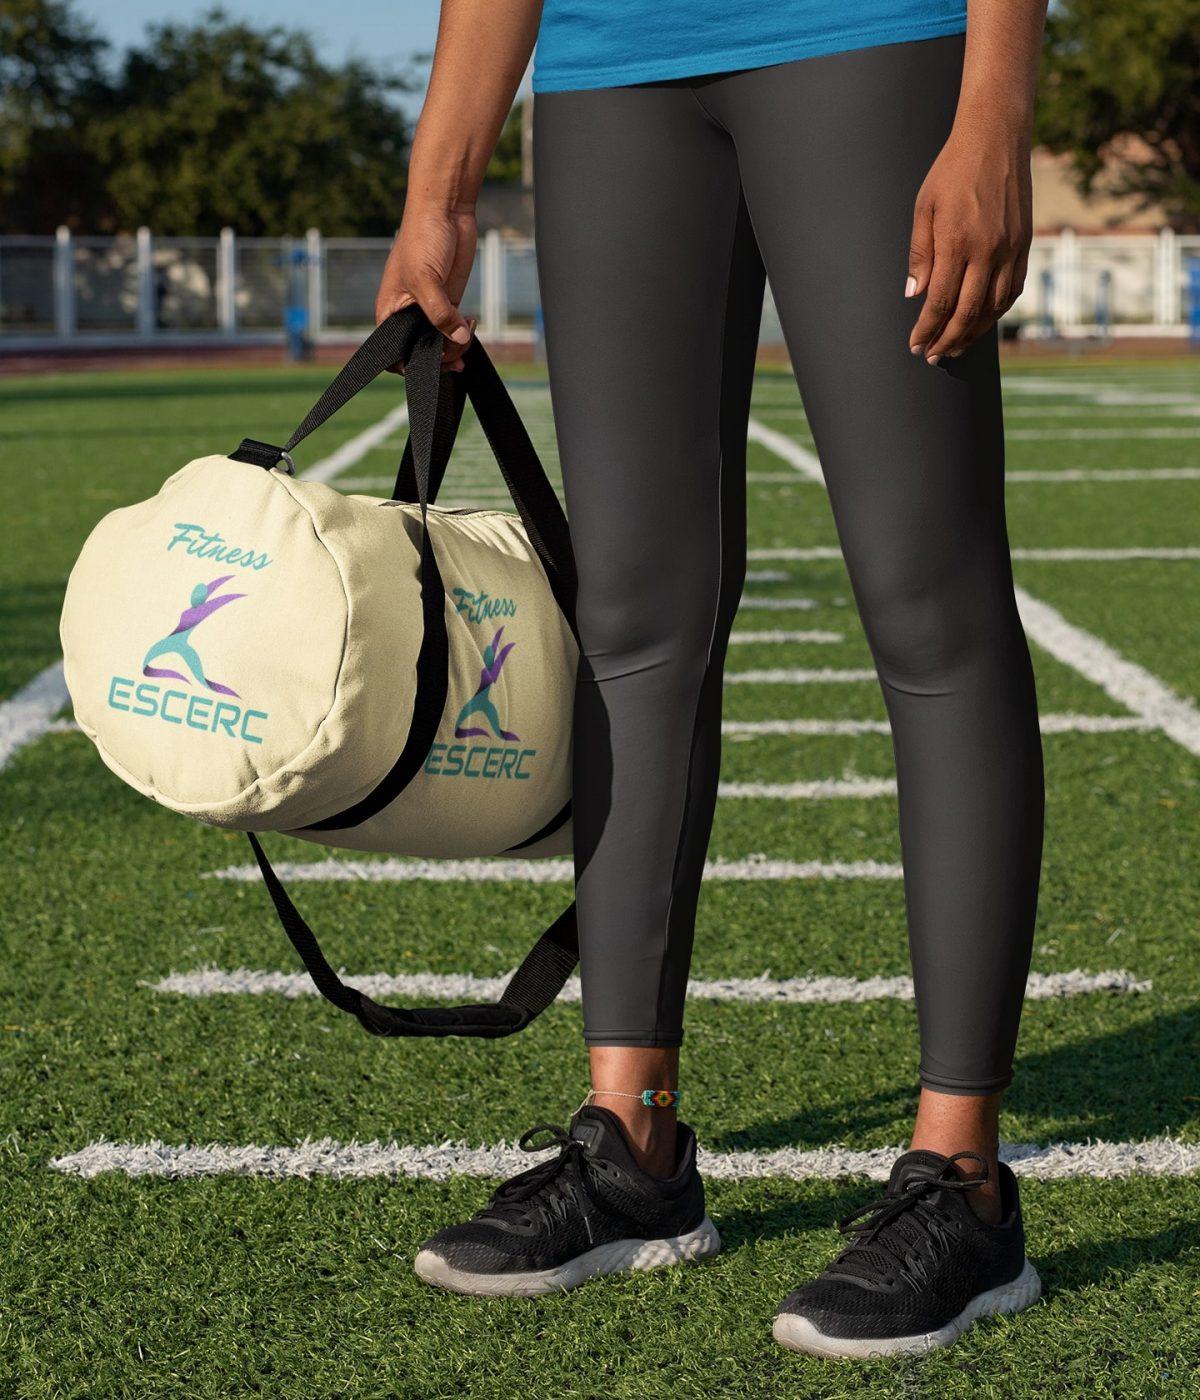 duffle-bag-mockup-featuring-a-woman-wearing-leggings-31348